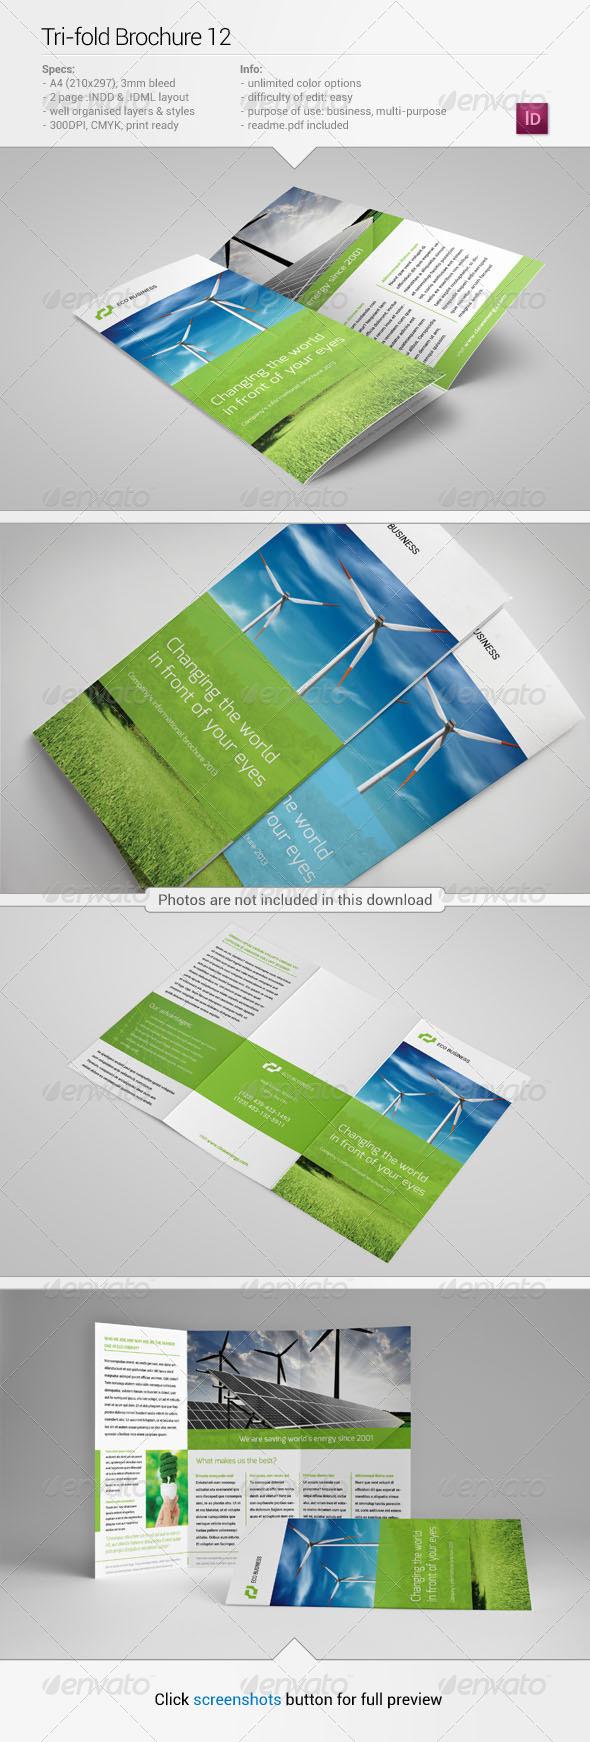 Tri-Fold Brochure 12